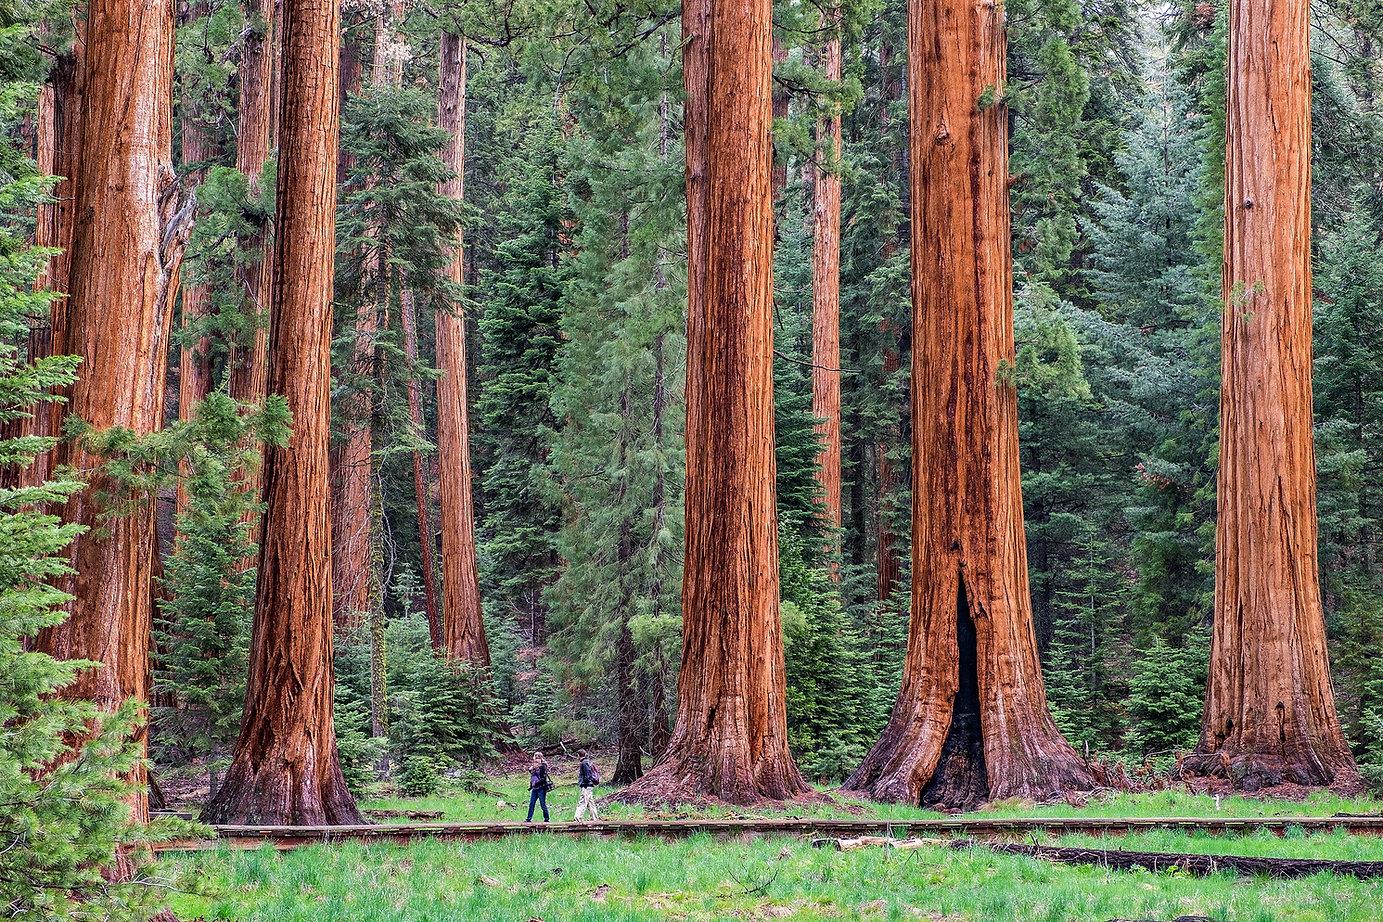 giant-tree-trail-sequoia-national-park.j